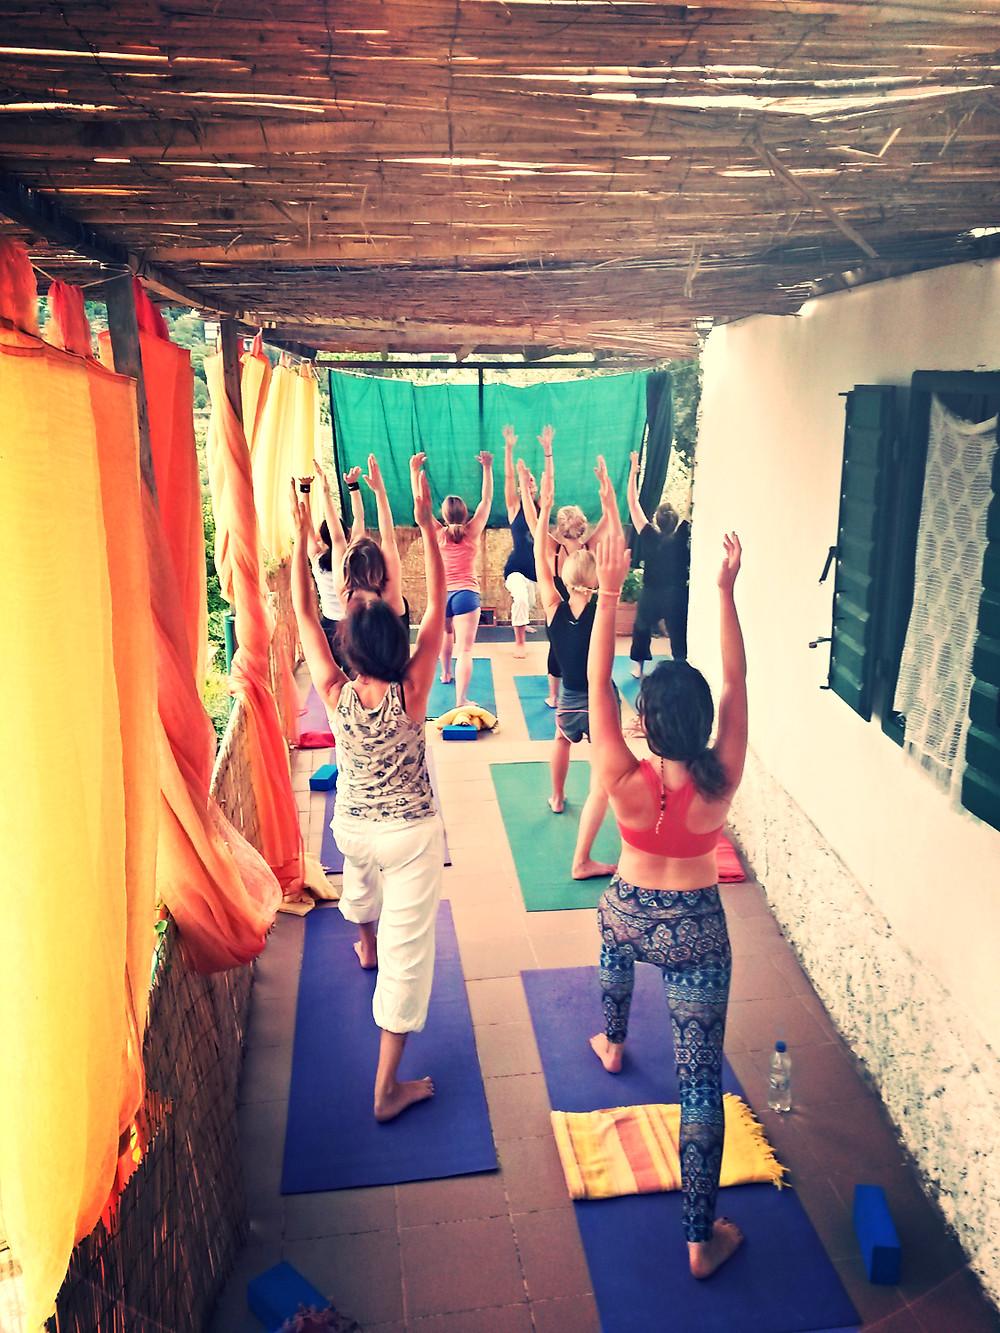 Transformative Yoga with Russelle Beardon at Suncokret Body & Soul Retreat, Hvar Island, Croatia